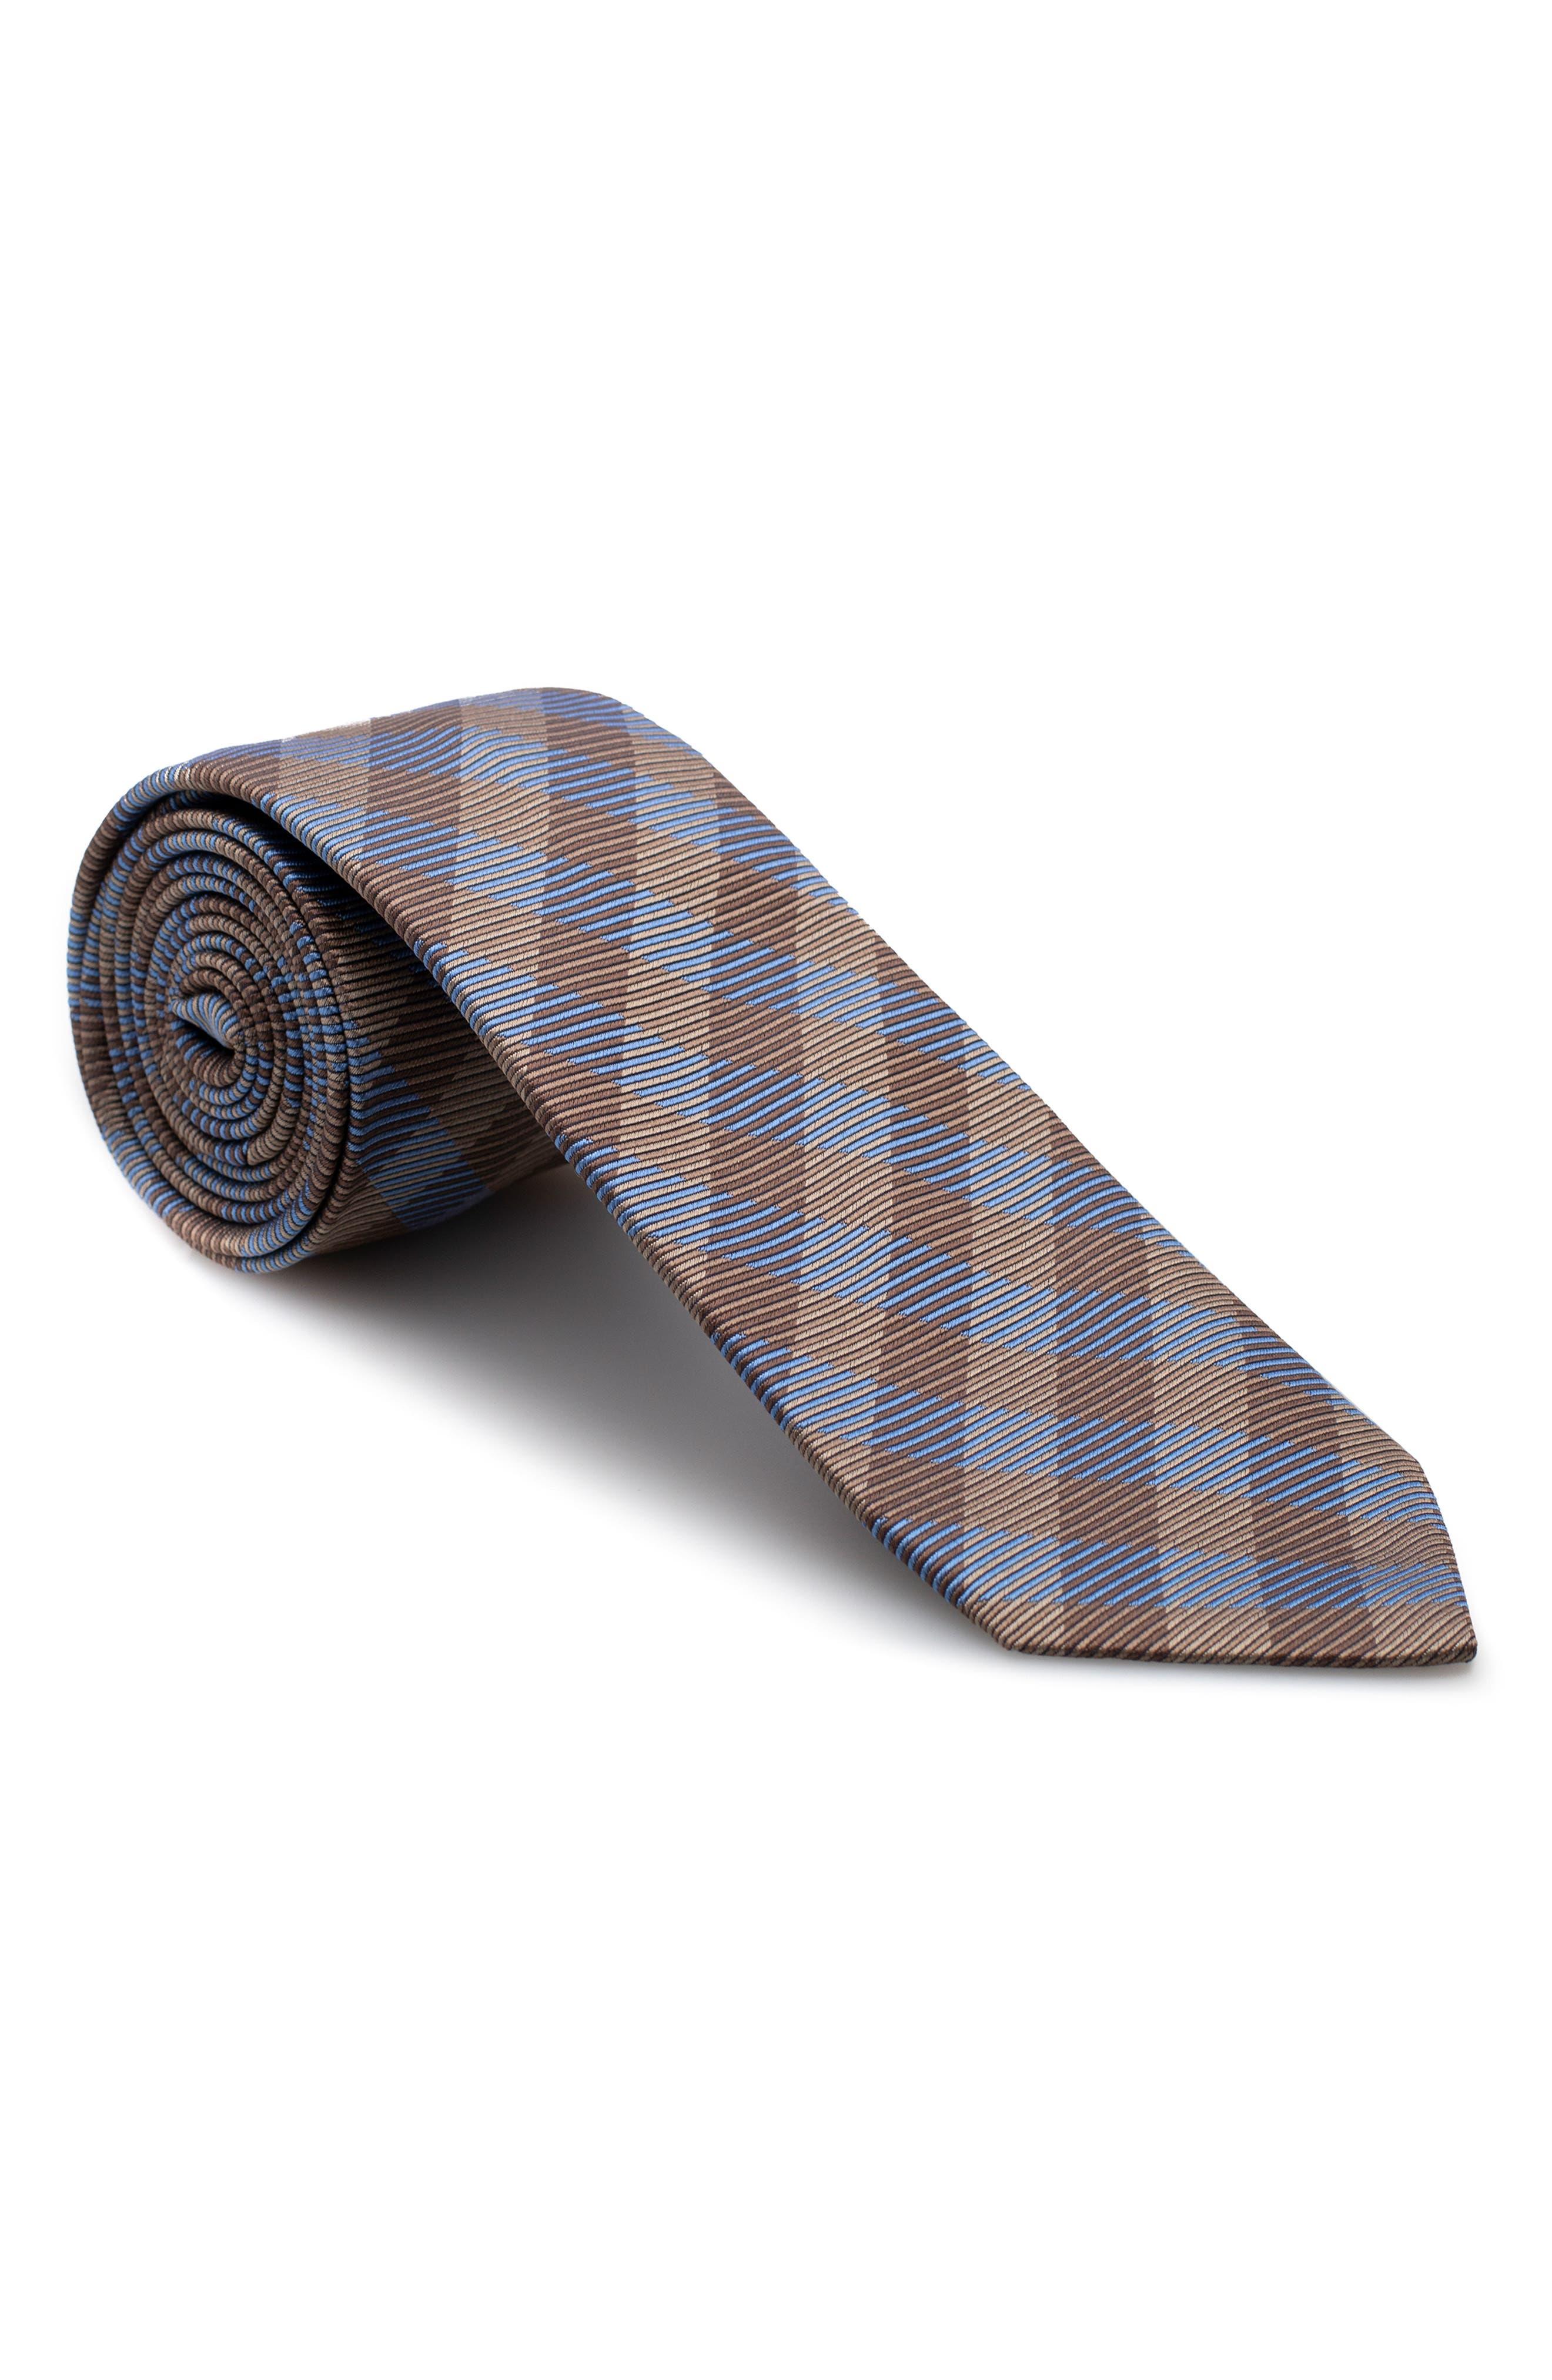 Plaid Silk Tie,                             Main thumbnail 1, color,                             200